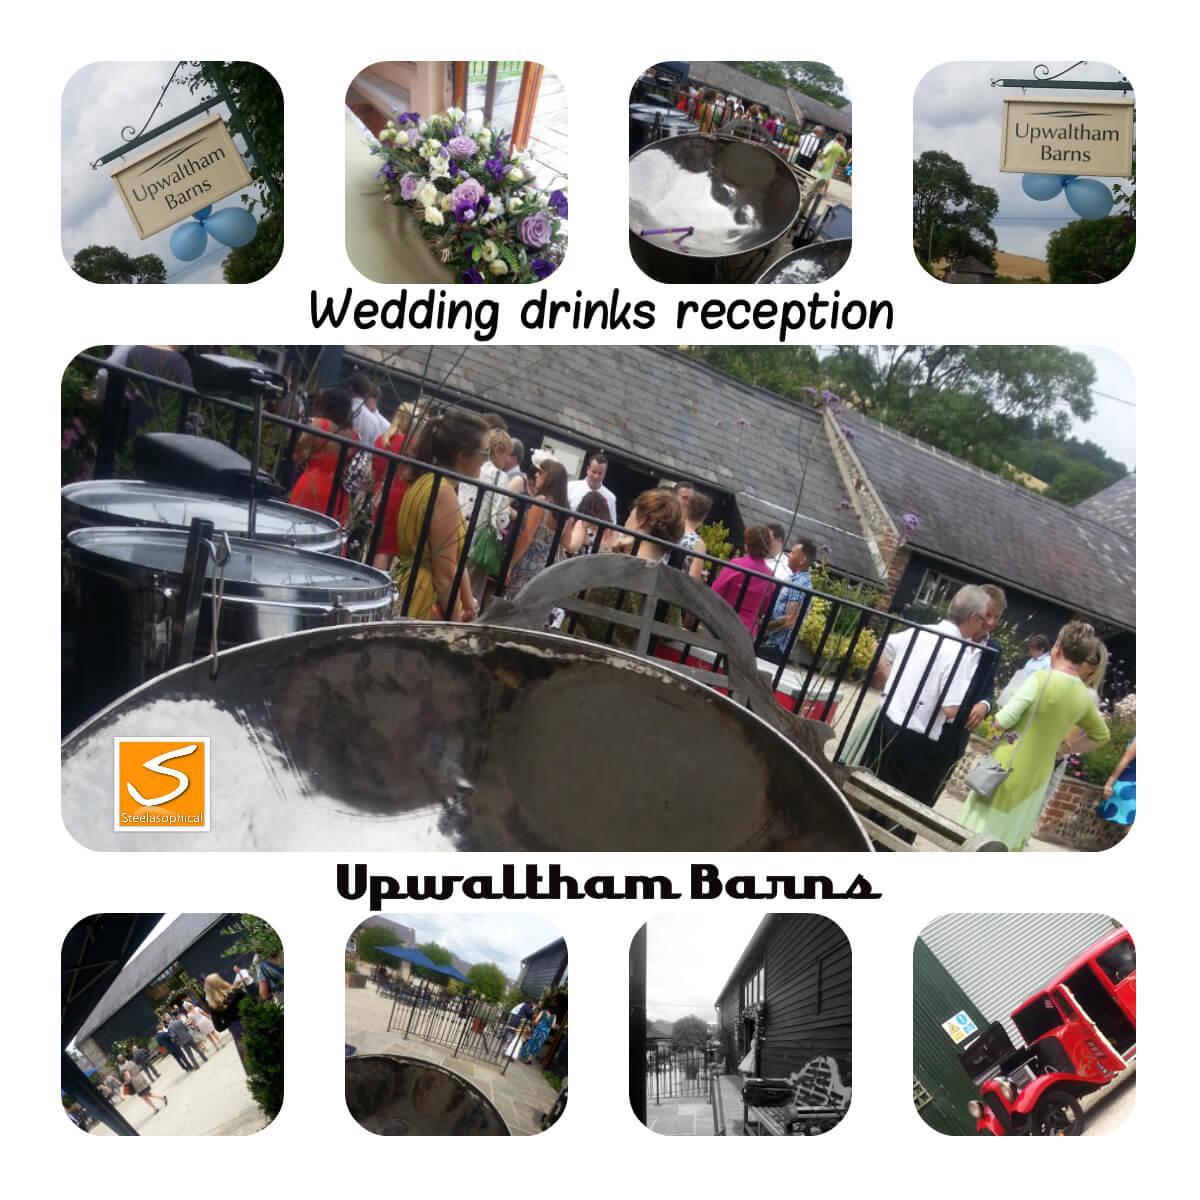 Upwalthams Barn Steelasophical wedding steel band Ceremony drinks reception